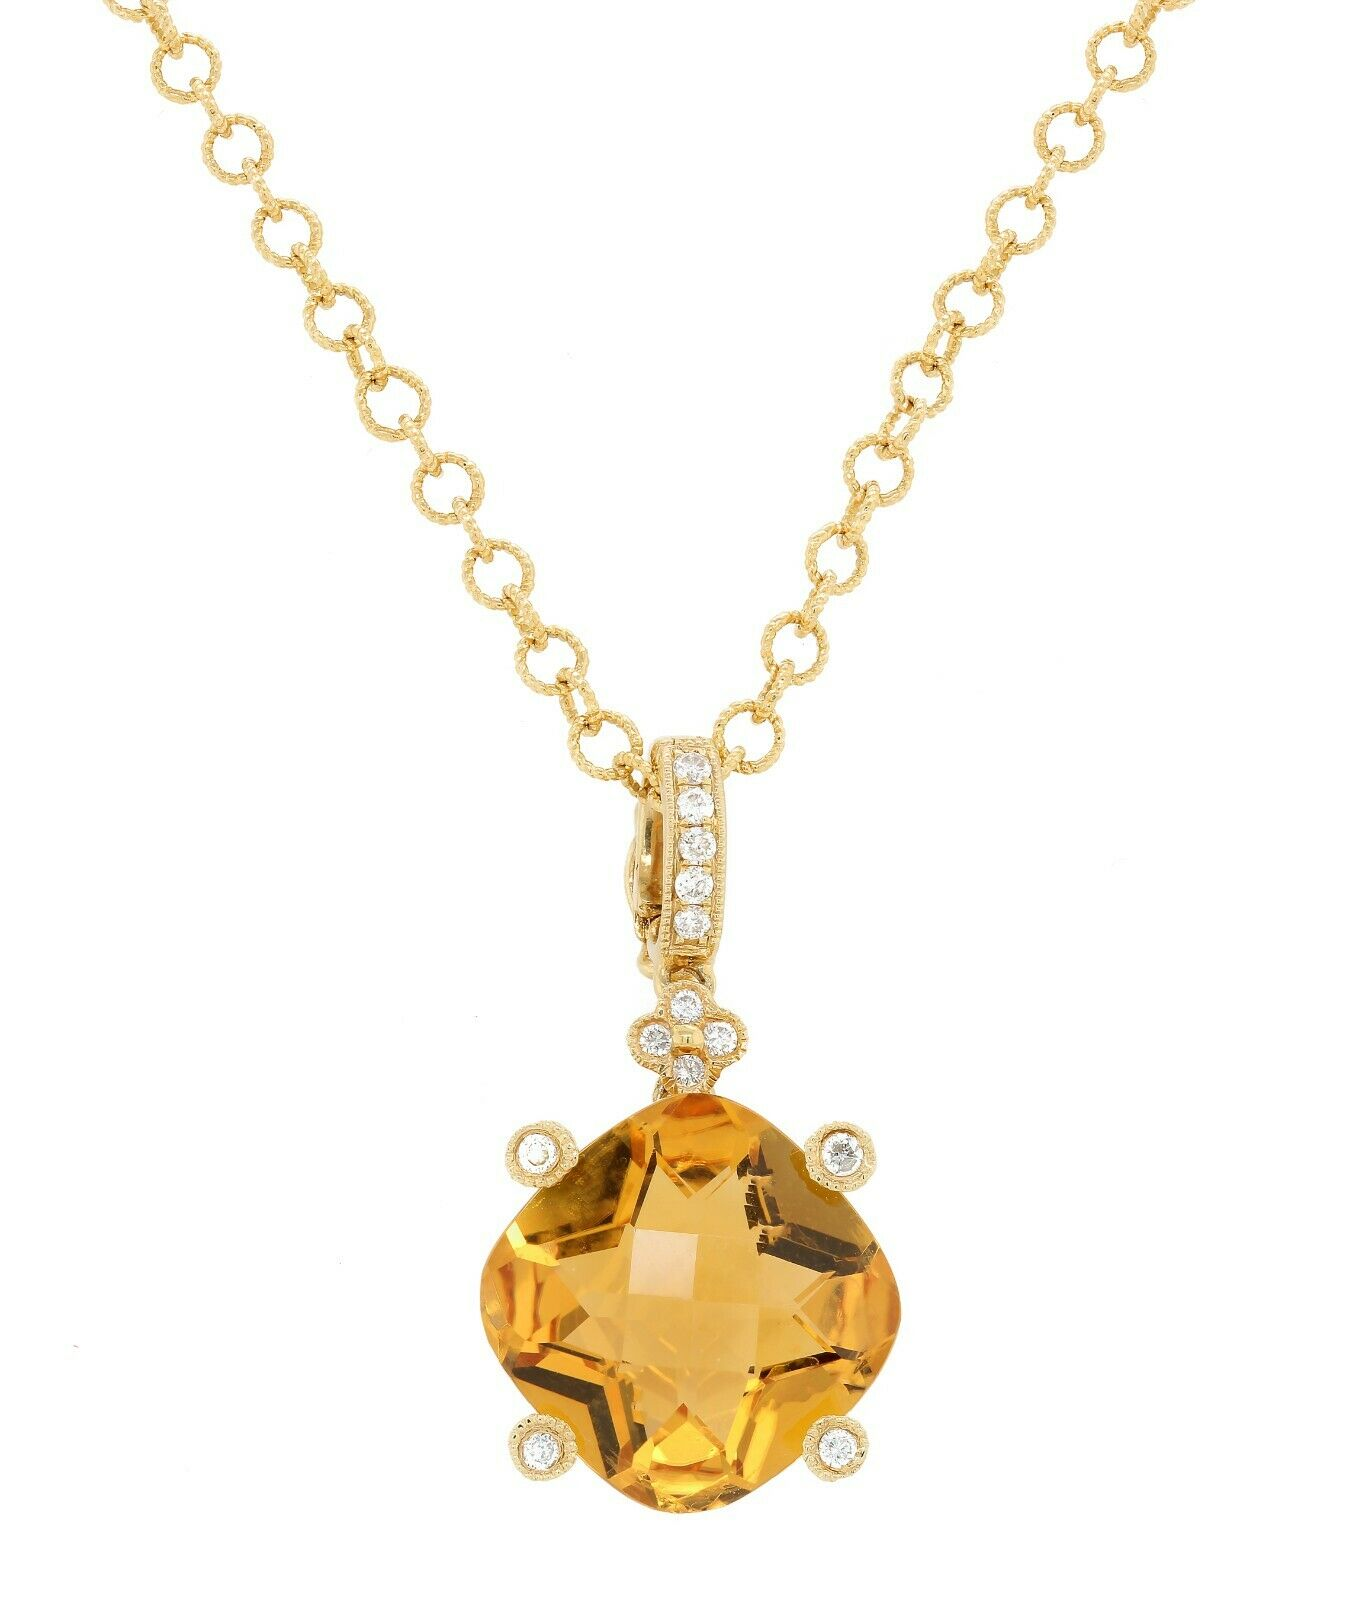 14 Karat Yellow Gold Round Pendant Natural Citrine